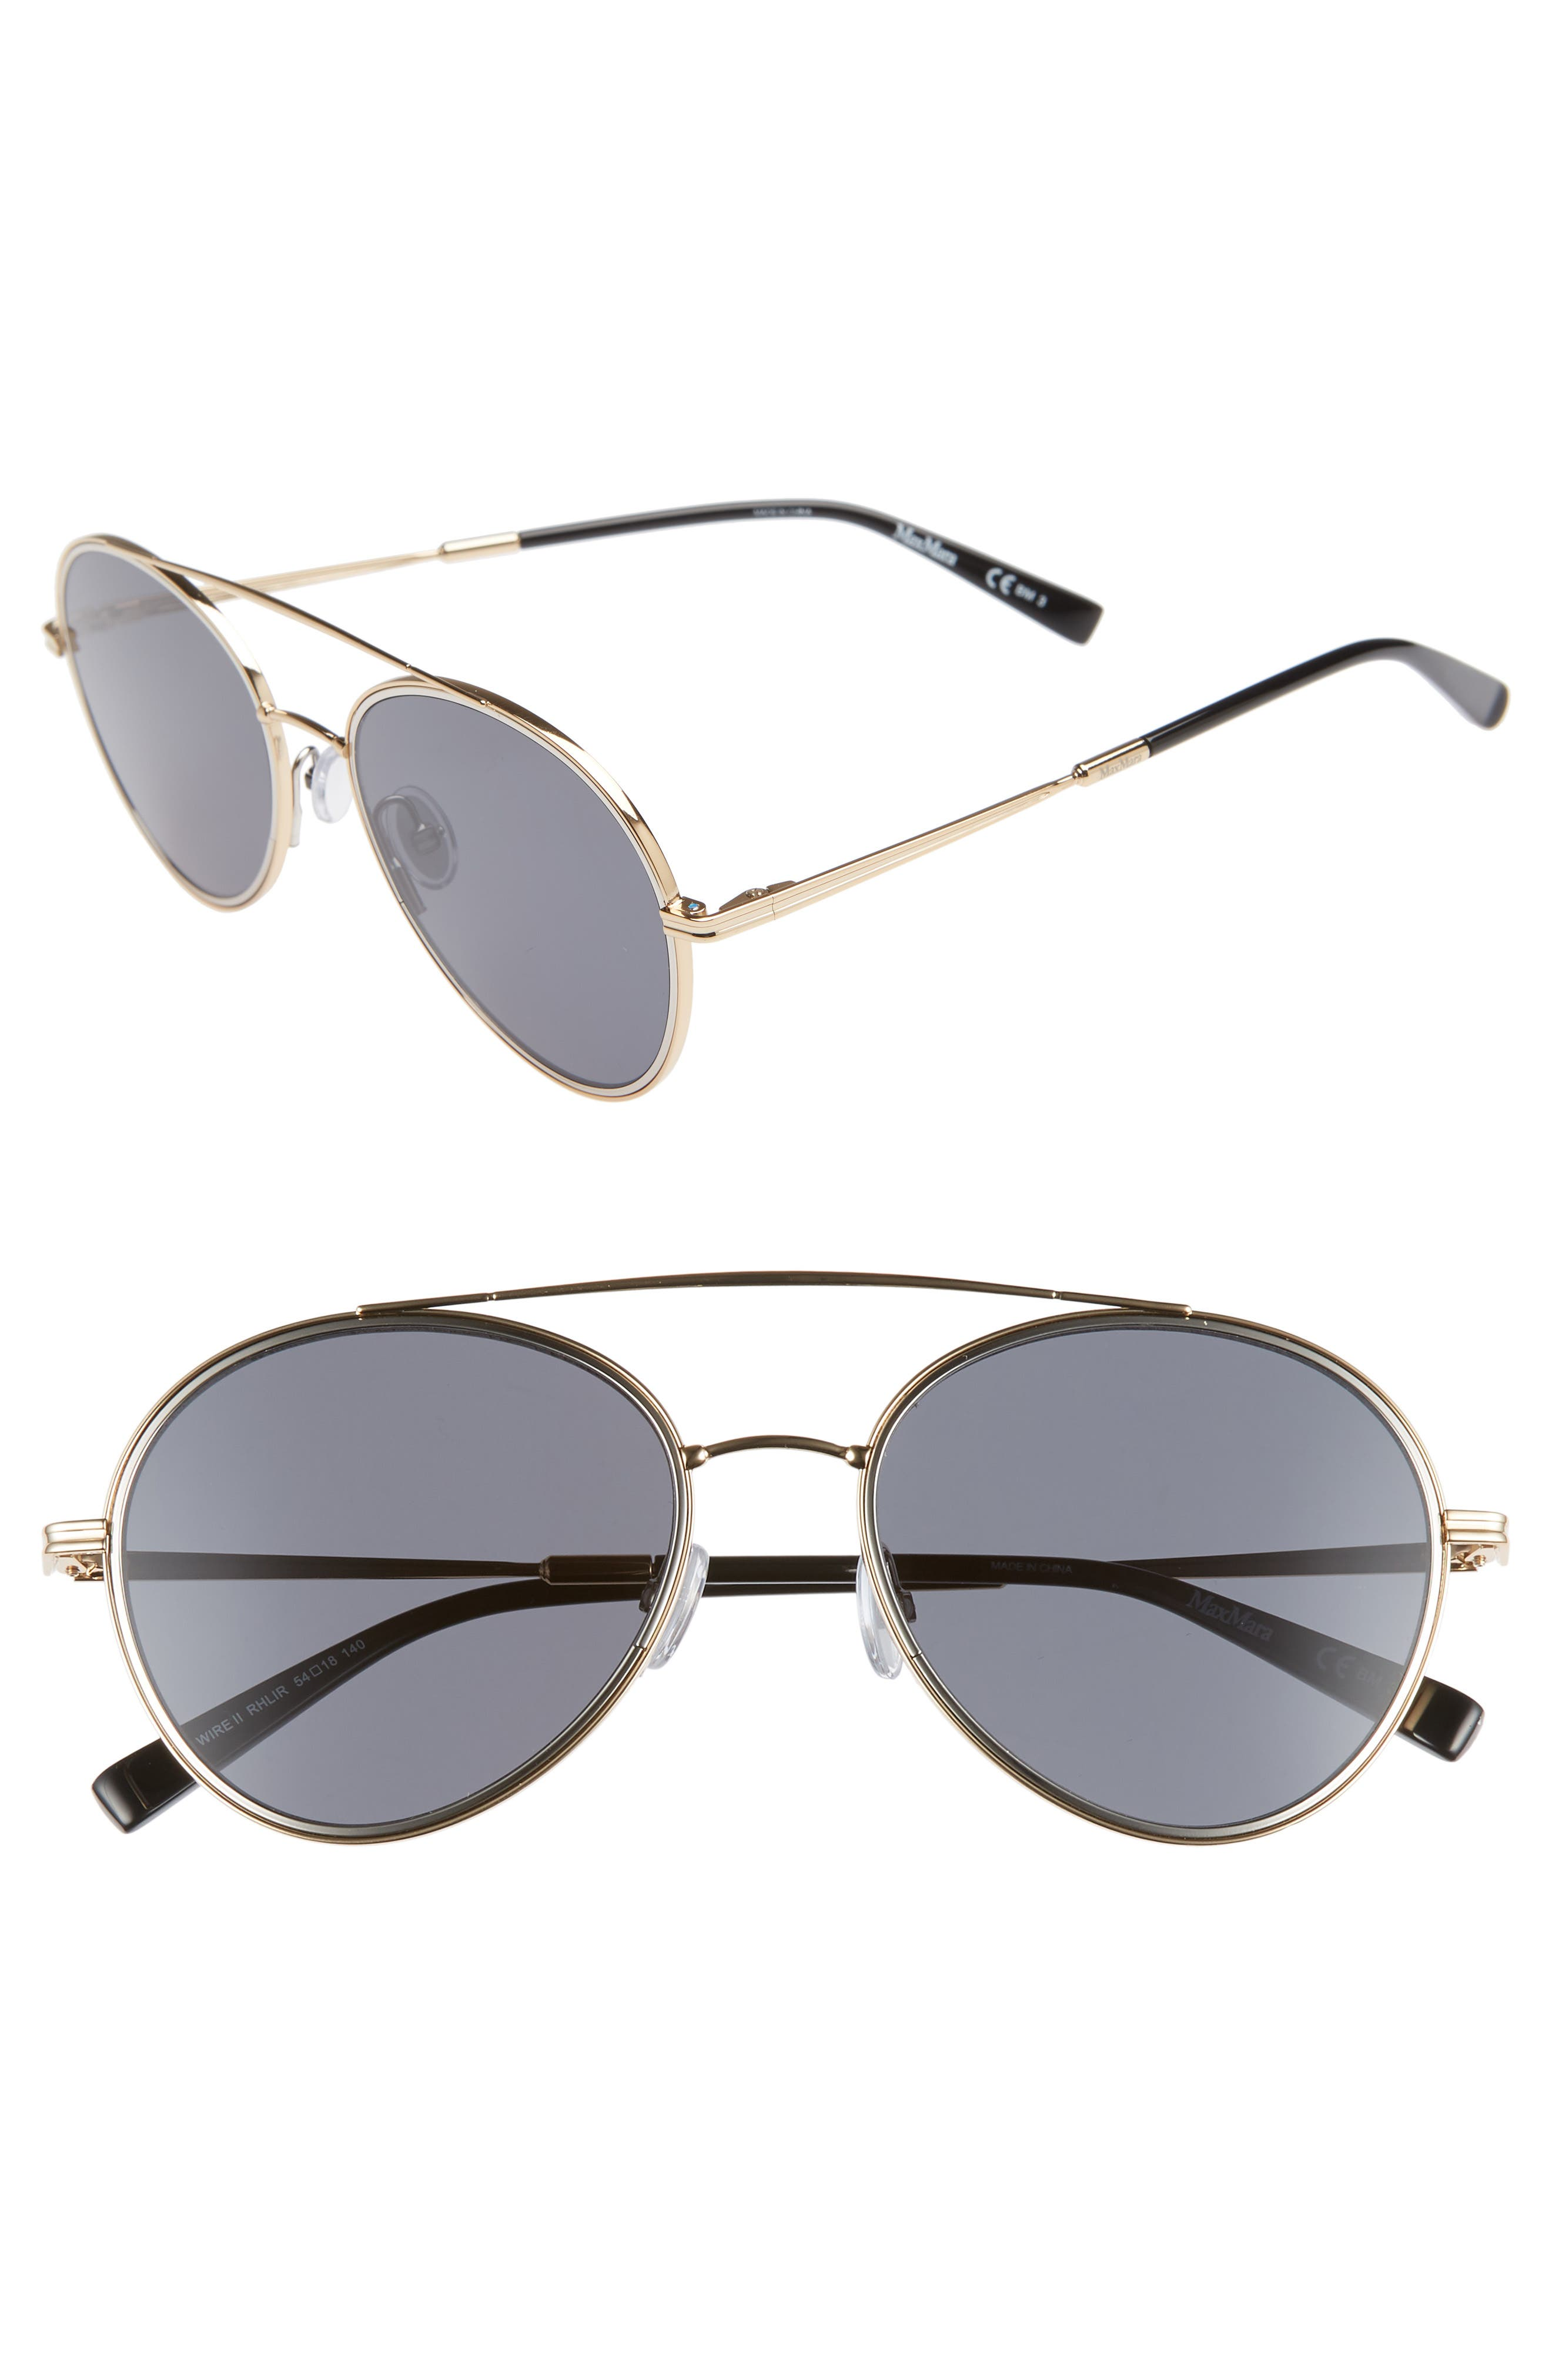 2e46d1fdc008 Buy max mara sunglasses & eyewear for women - Best women's max mara  sunglasses & eyewear shop - Cools.com